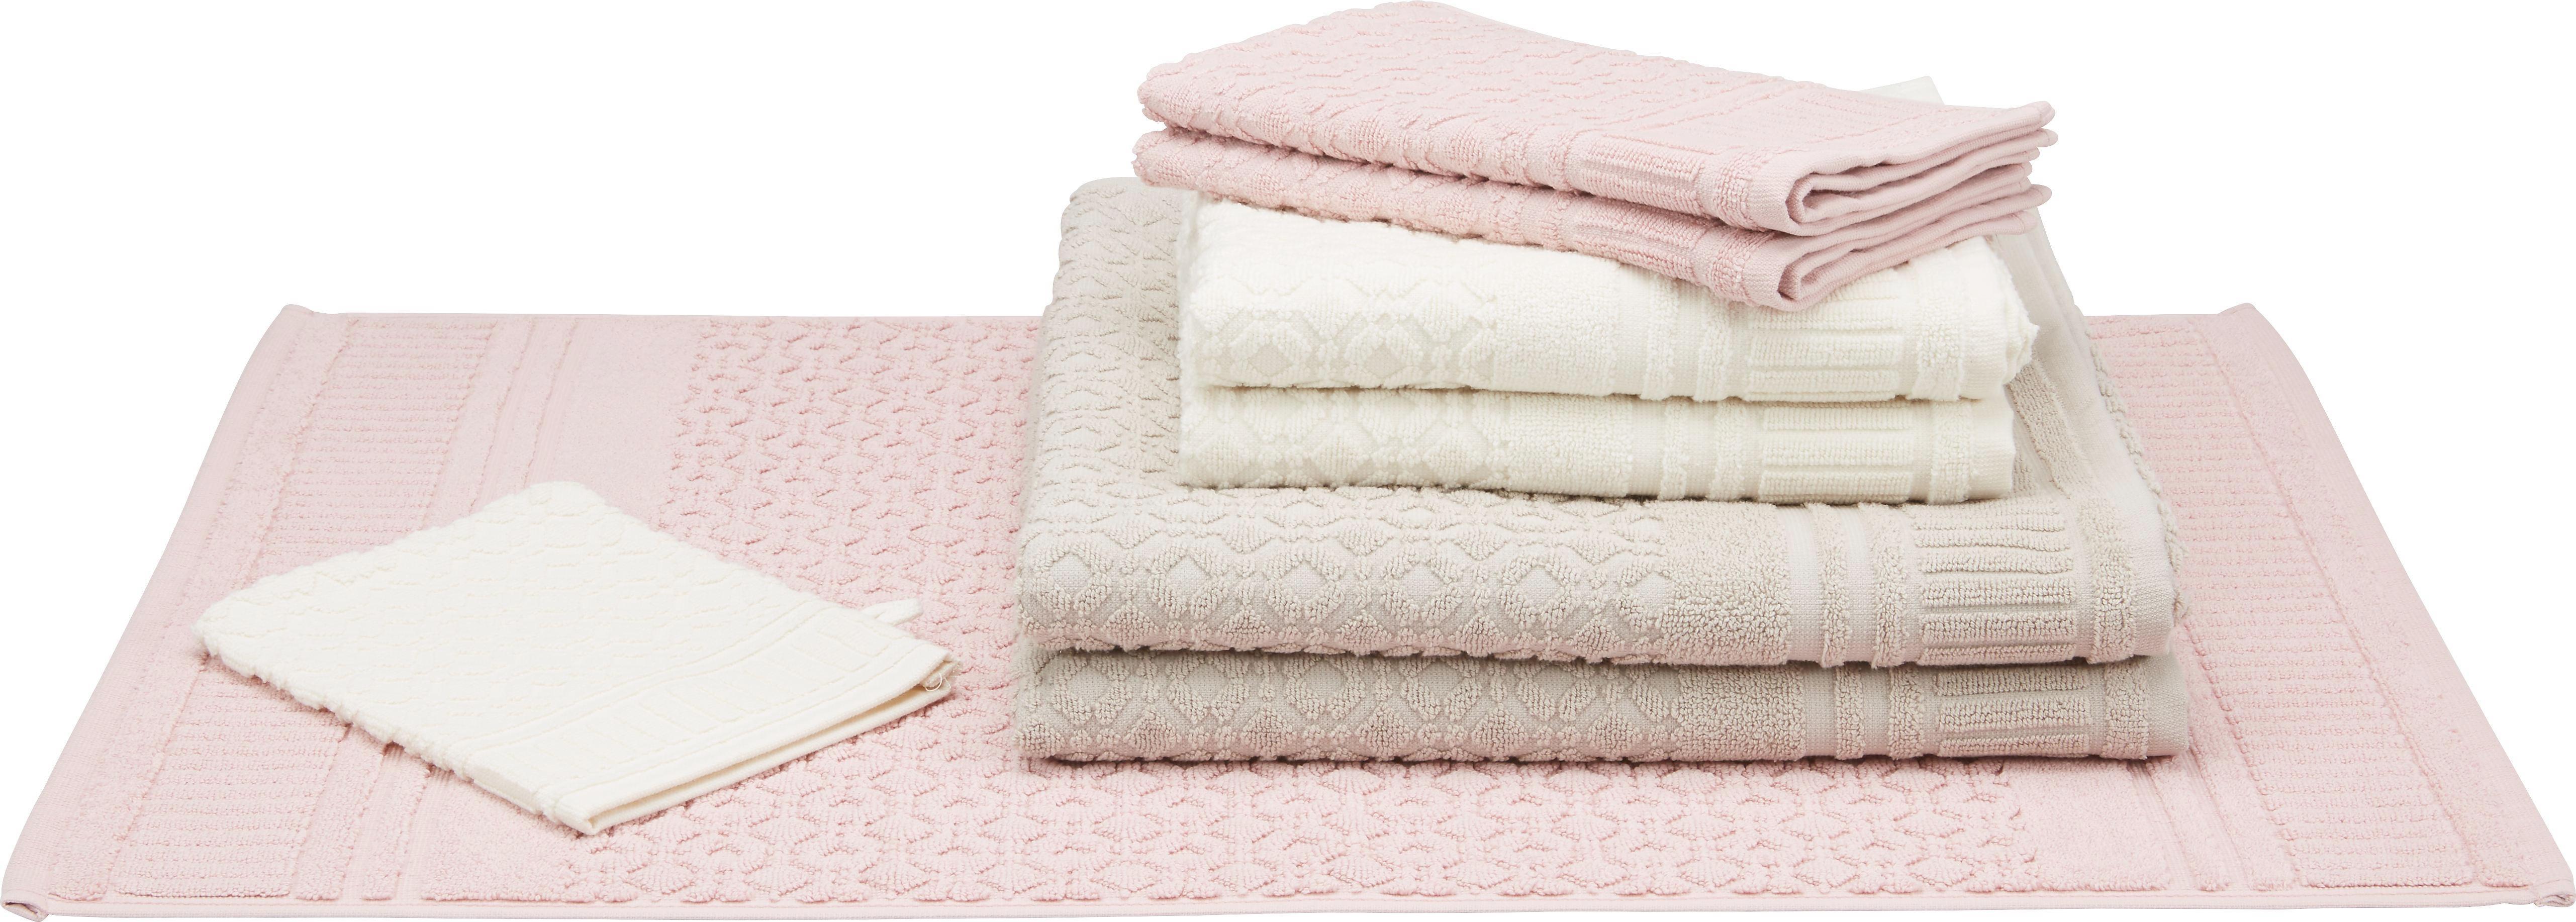 Handtuch Carina Aus Rosa - Rosa, ROMANTIK / LANDHAUS, Textil (50/100cm) - MÖMAX modern living